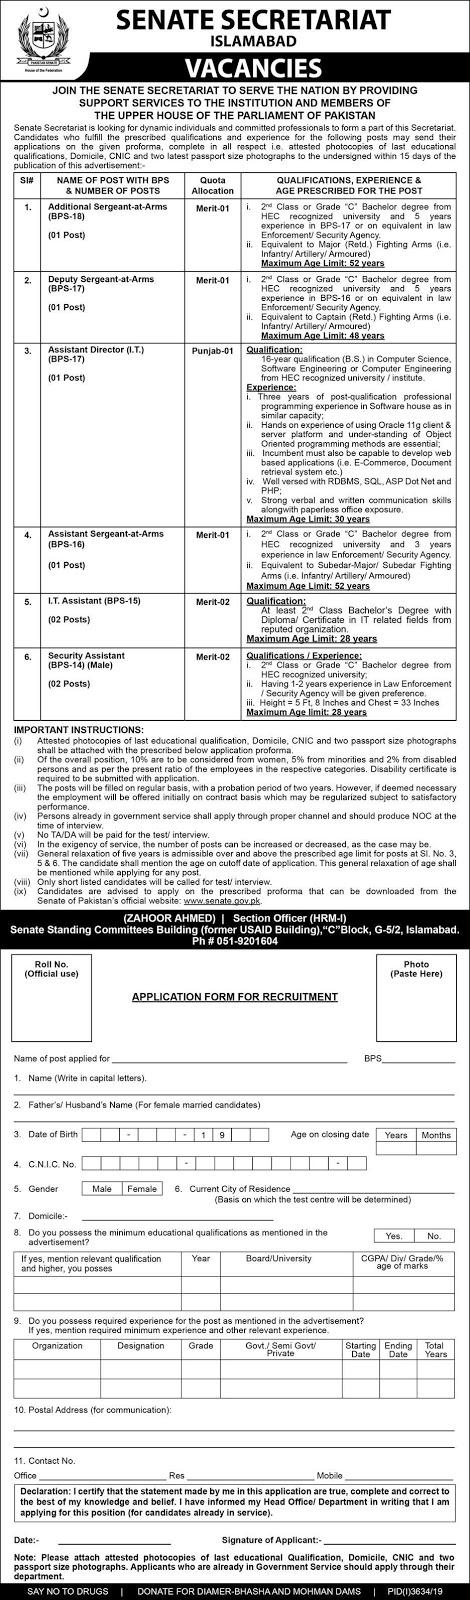 Senate Secretariat Islamabad Jobs 2020 Pakistan